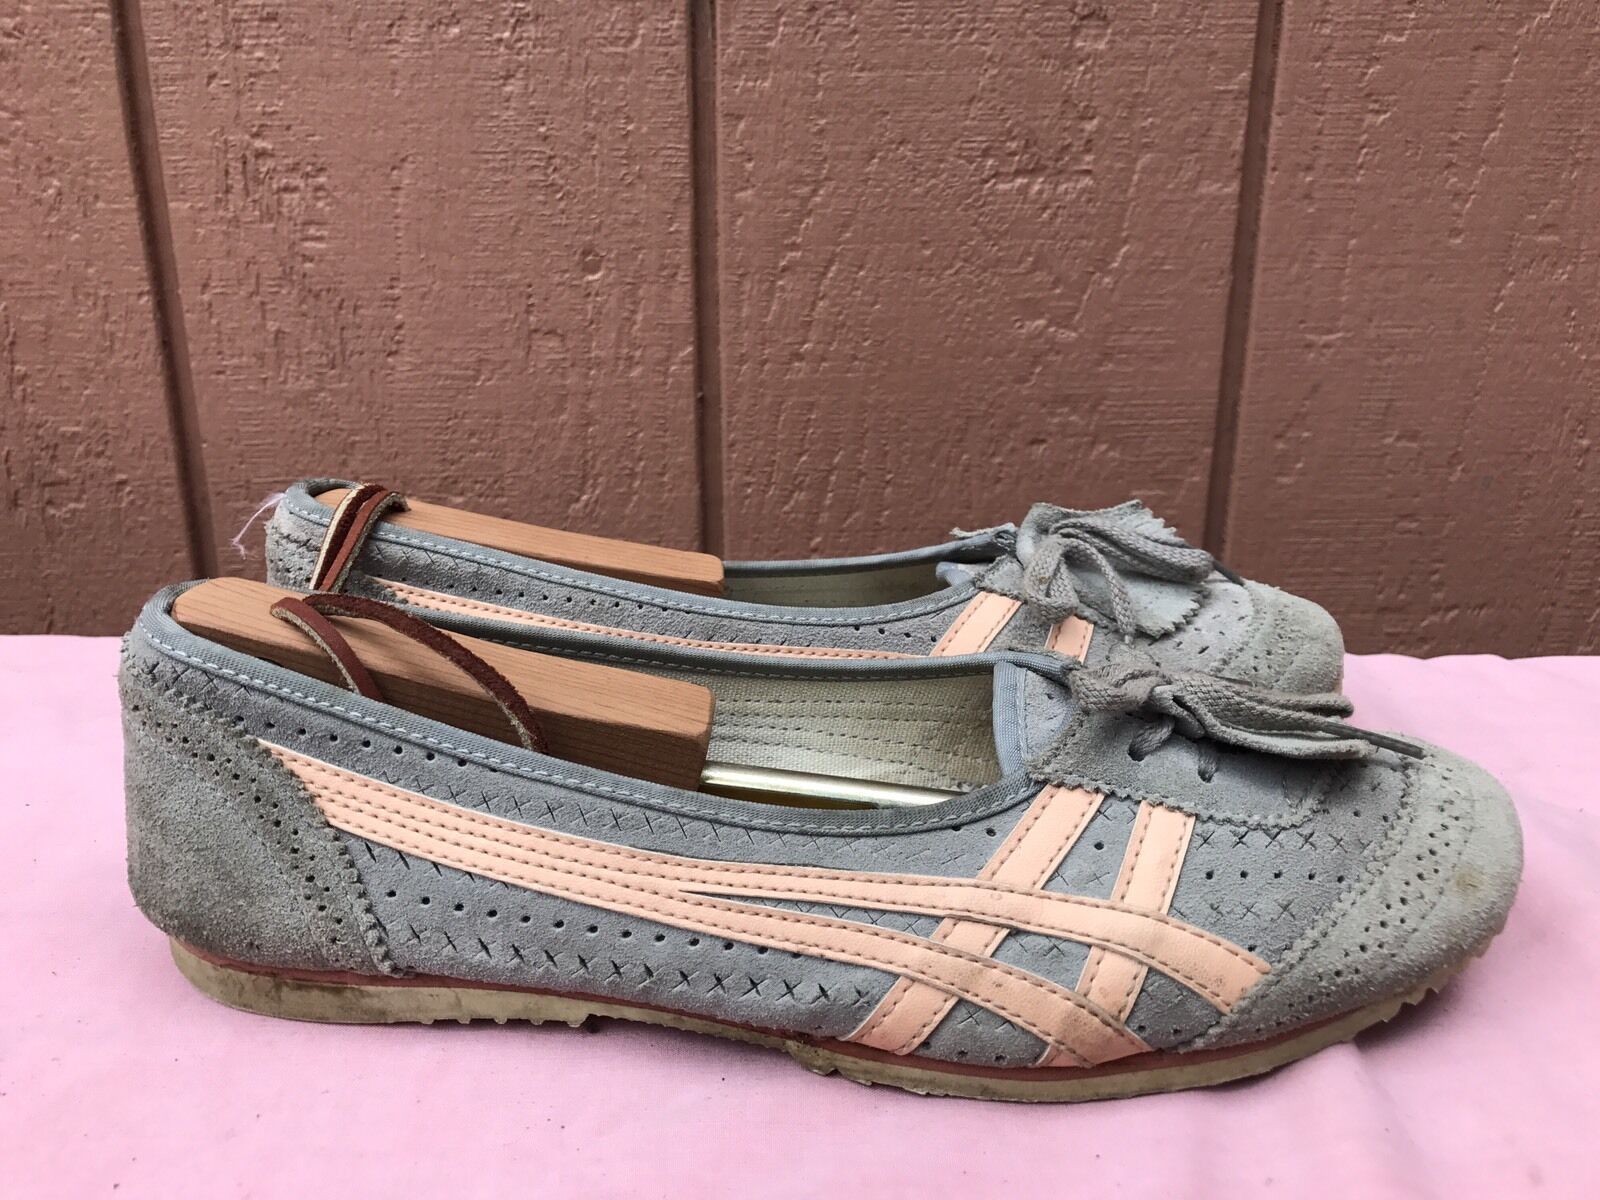 RARE Onitsuka Tiger Norico HL8A9 Gray Suede Ballet Flats Comfortable Great discount